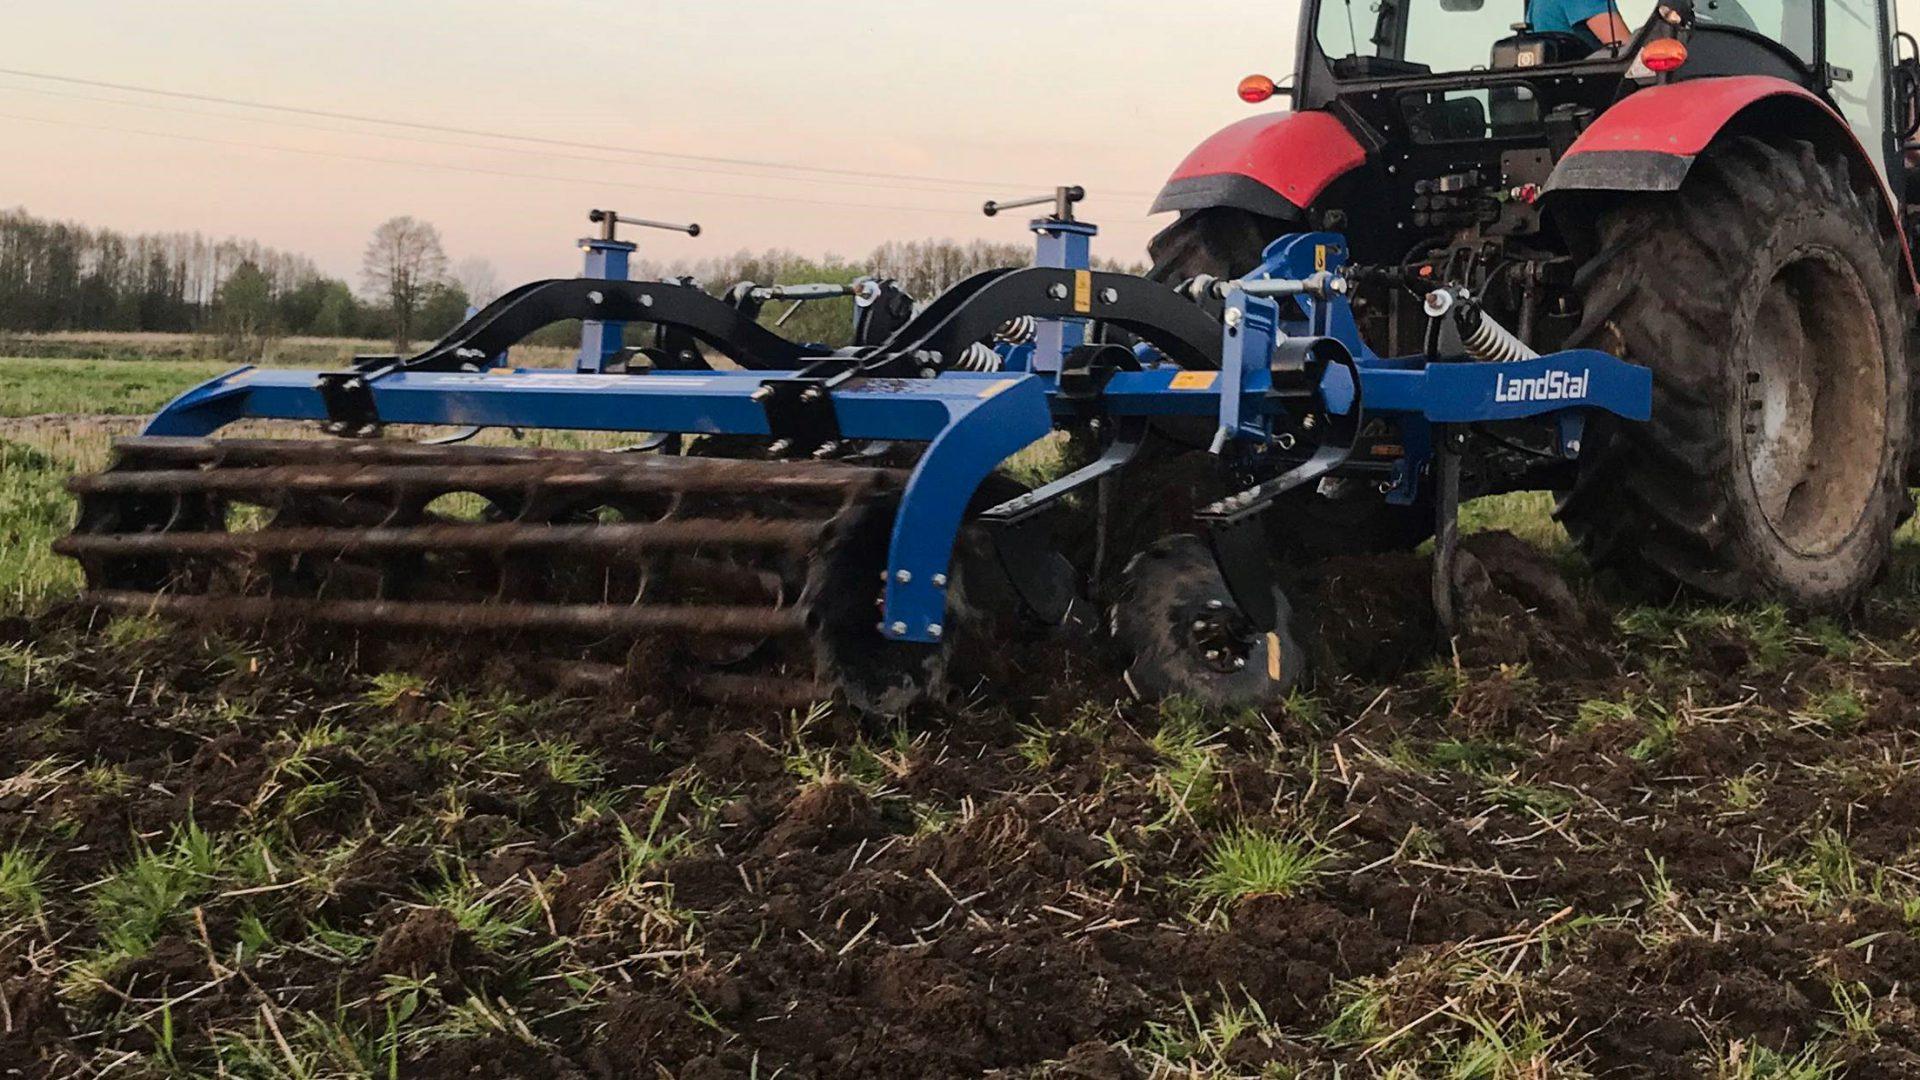 Landstal realizza combinate adatte a operare in terreni di ogni genere